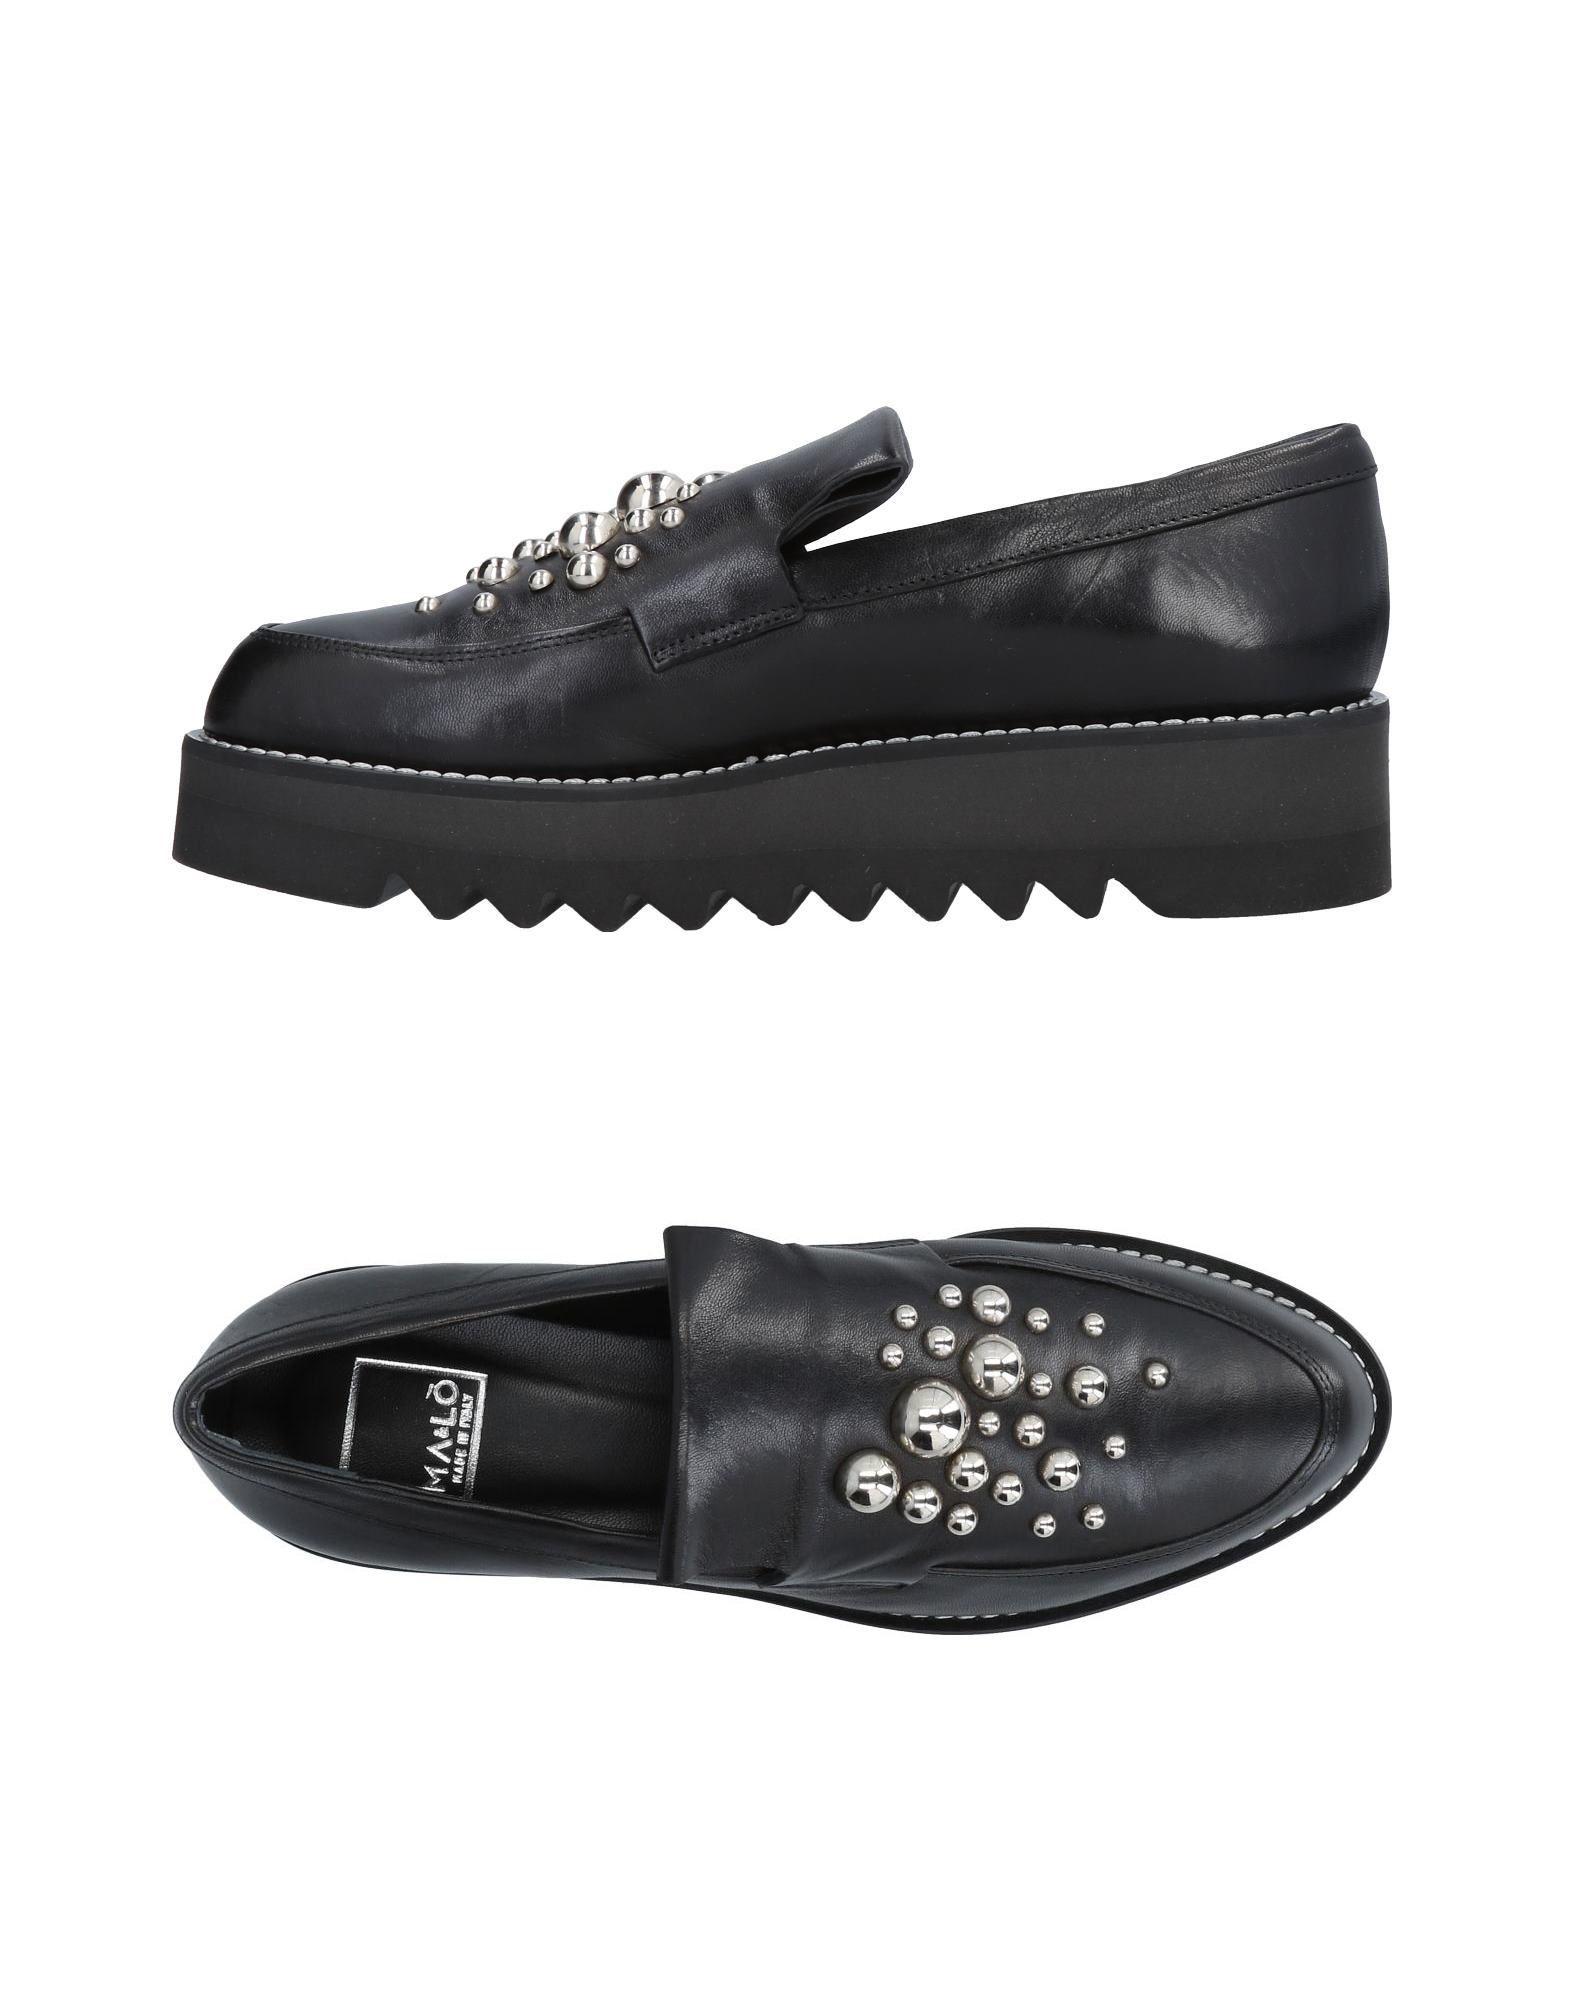 Gut Gut Gut um billige Schuhe zu tragenMa & Lo' Mokassins Damen  11485966OD 7f2be5